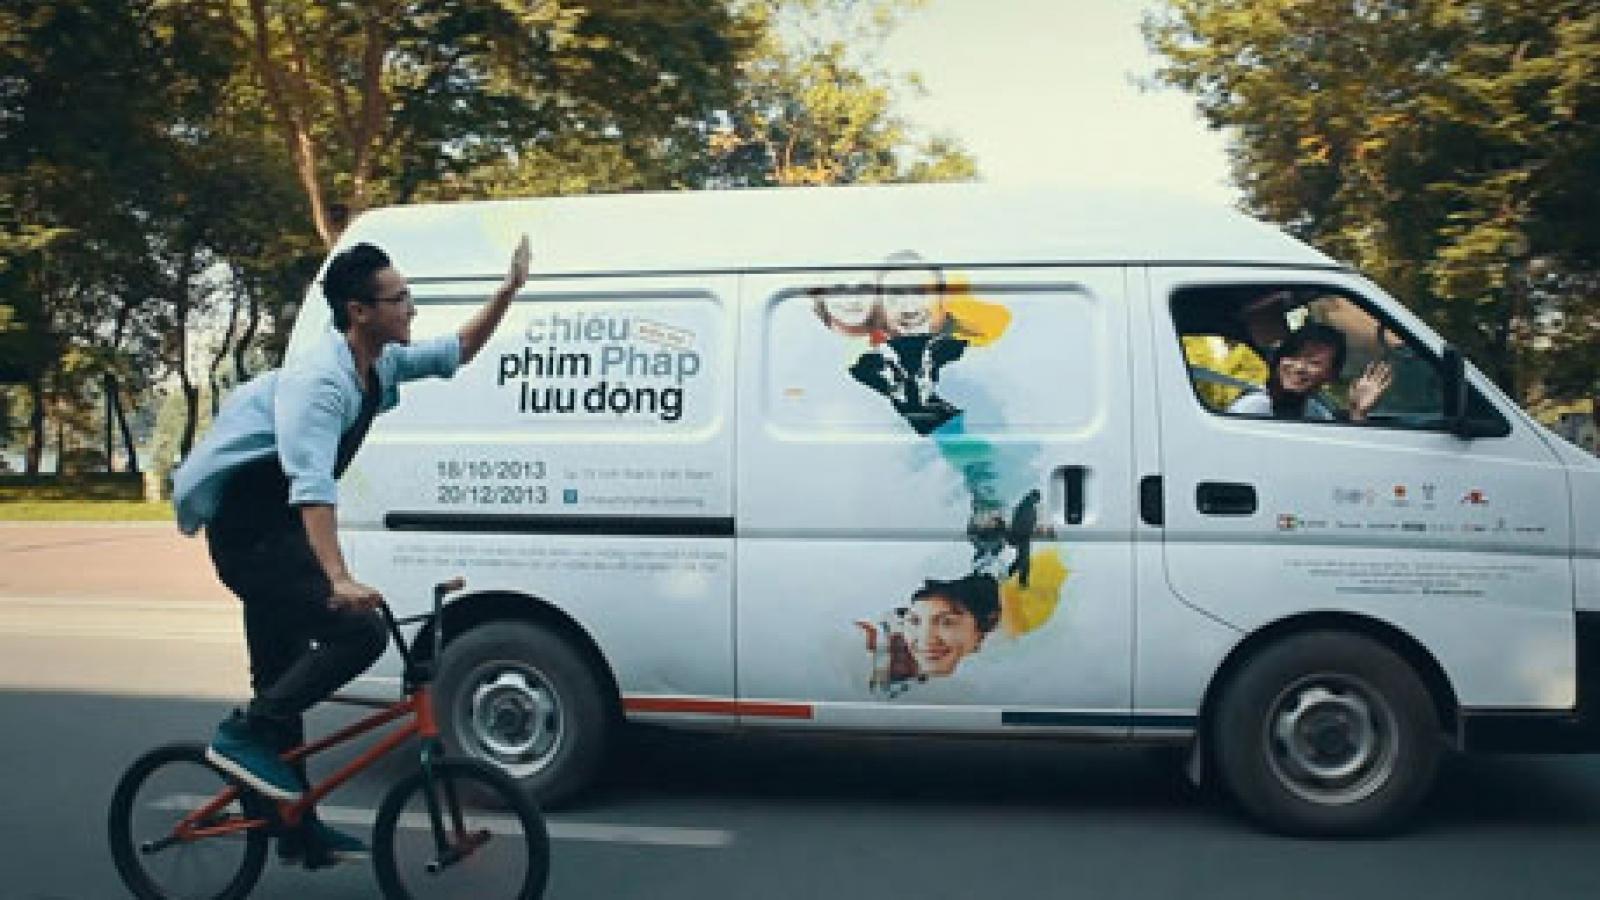 Touring French film screenings through Vietnam